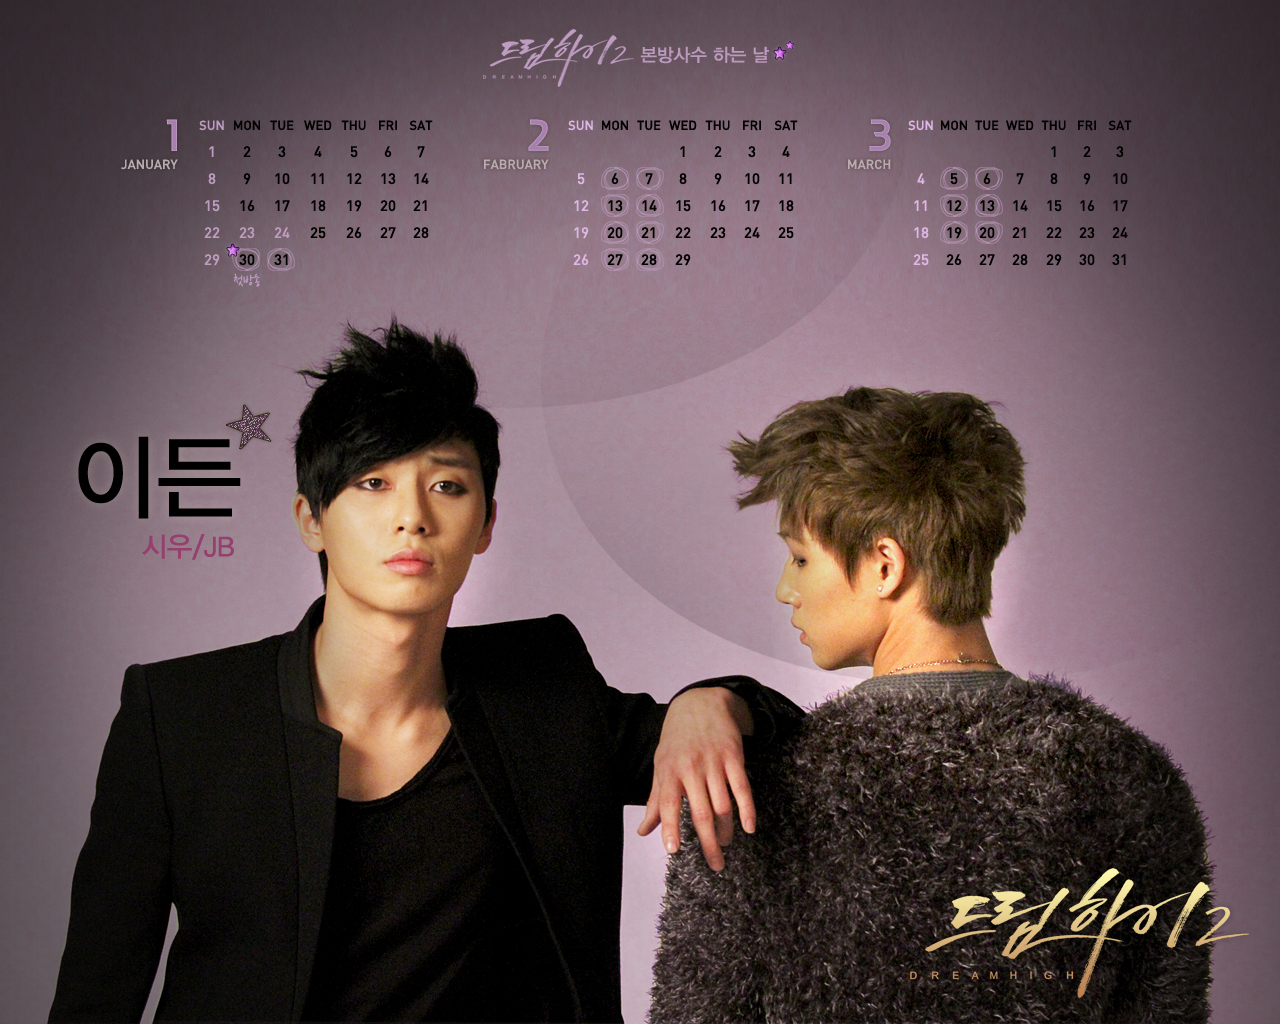 korean drama overload: dream high 2 teaser, wallpapers, calendars